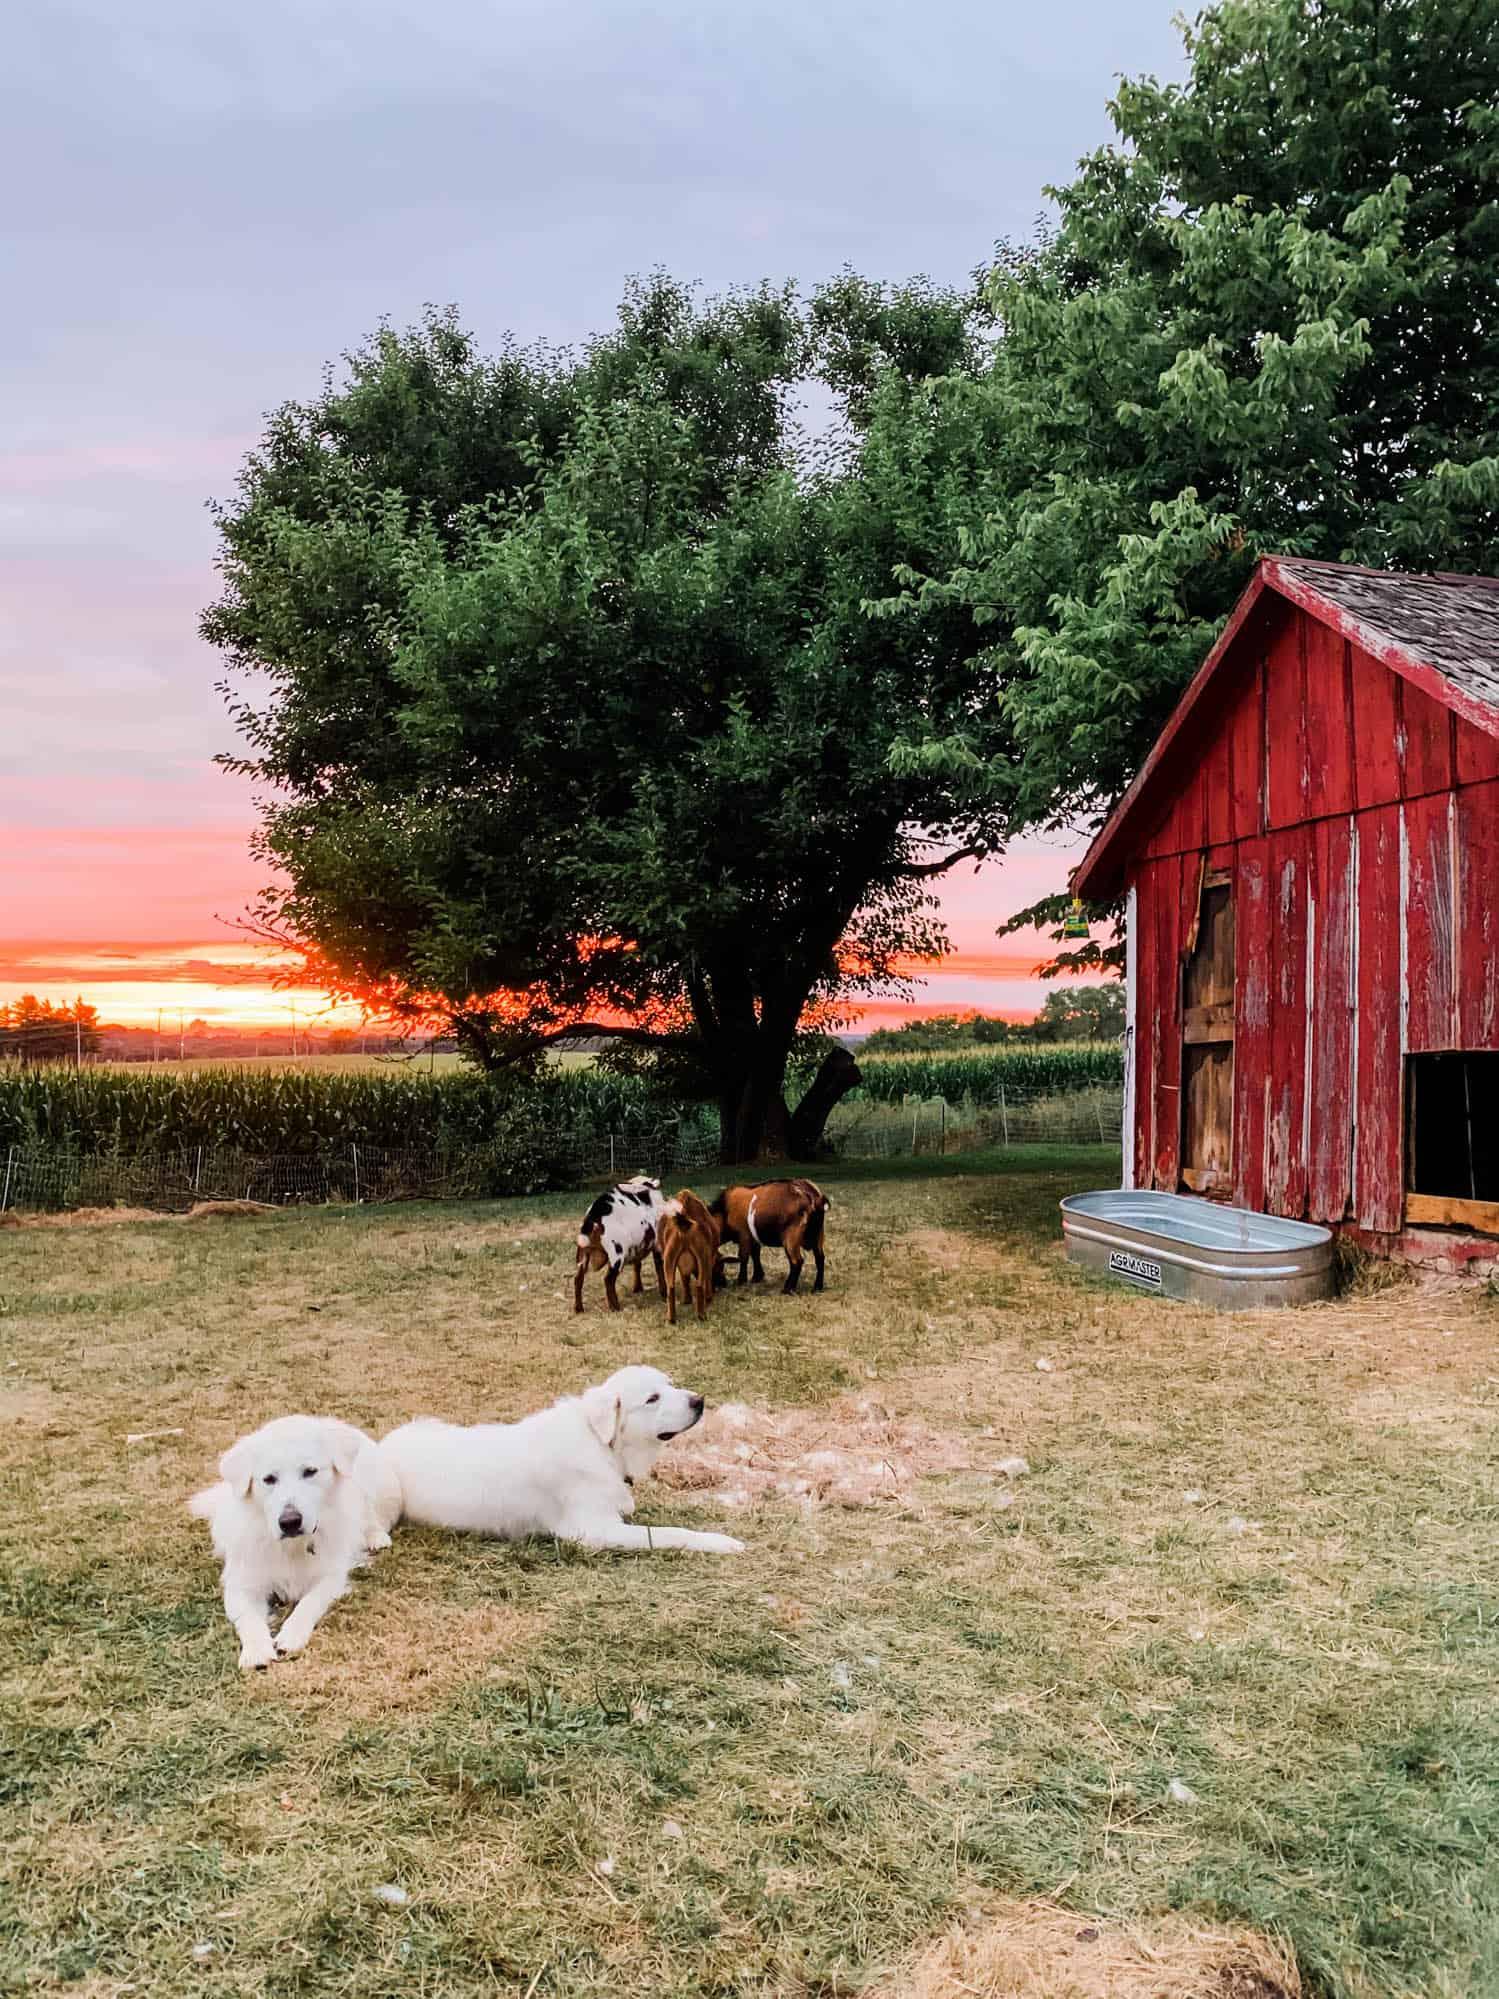 Frenchie Farm raising livestock guardian dogs